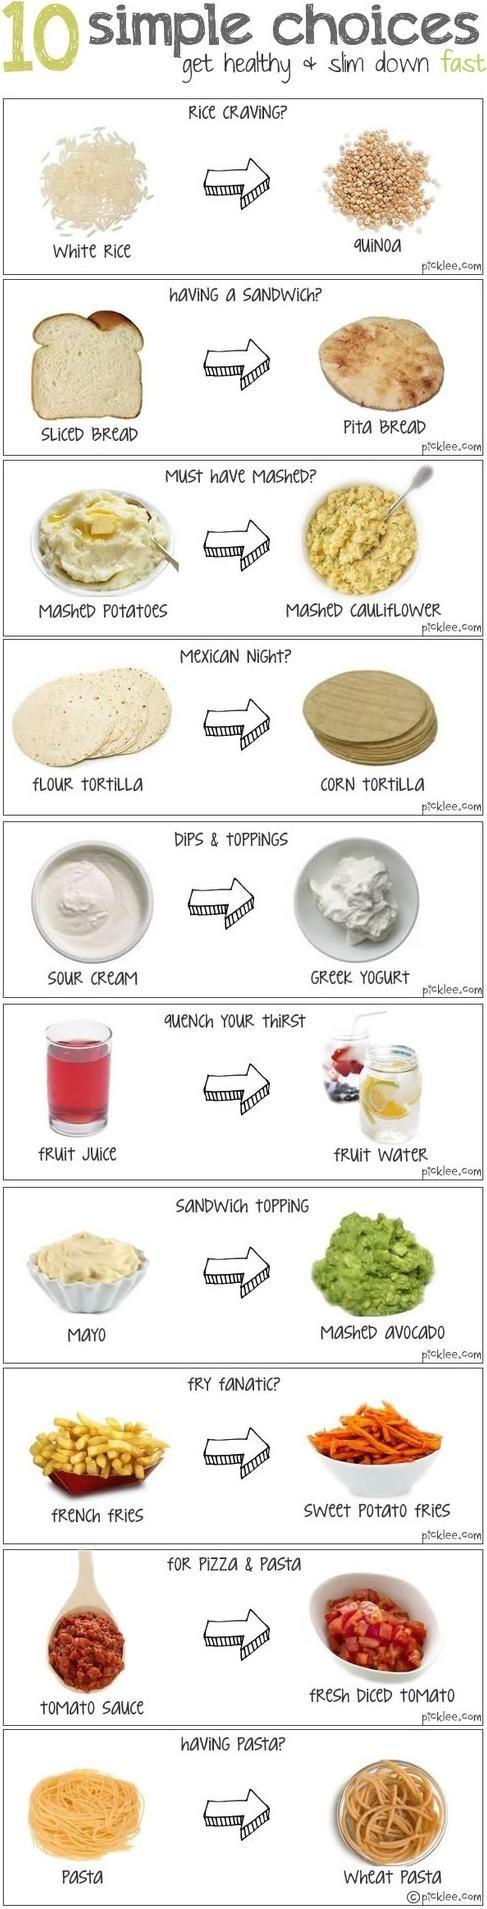 Food 10 Simple Choices